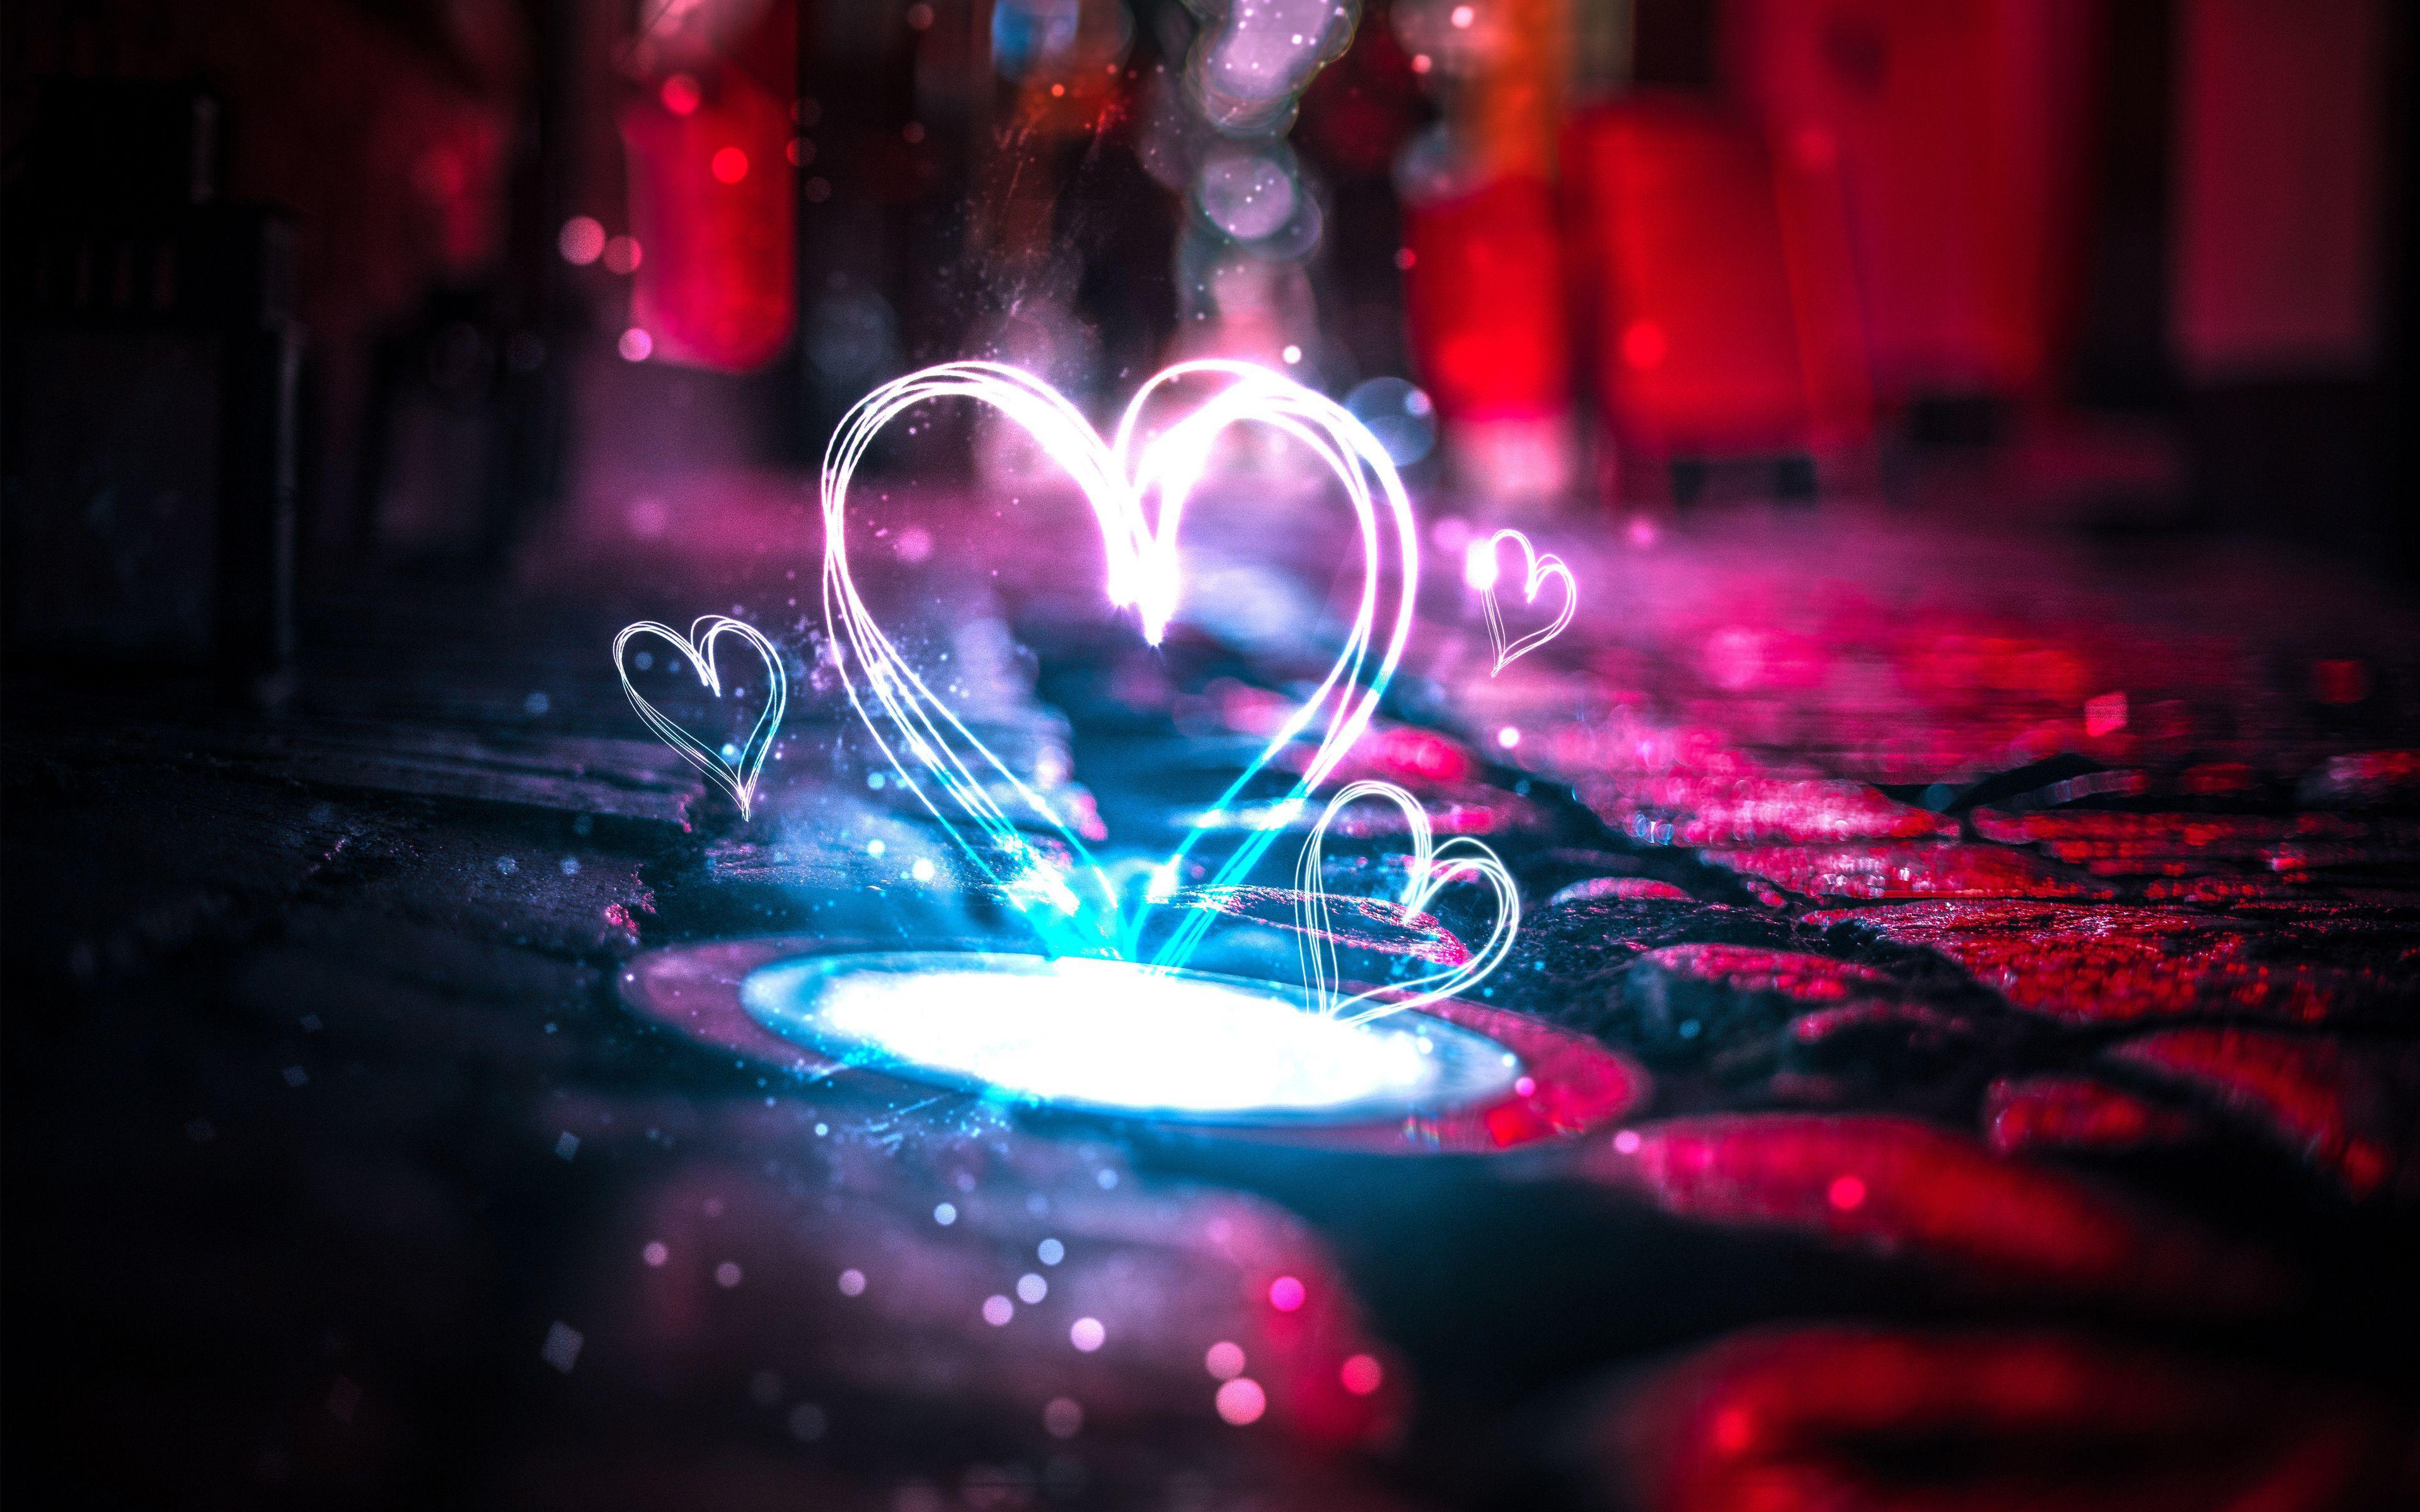 3840x2400 Neon Love Hearts Hình nền 4K